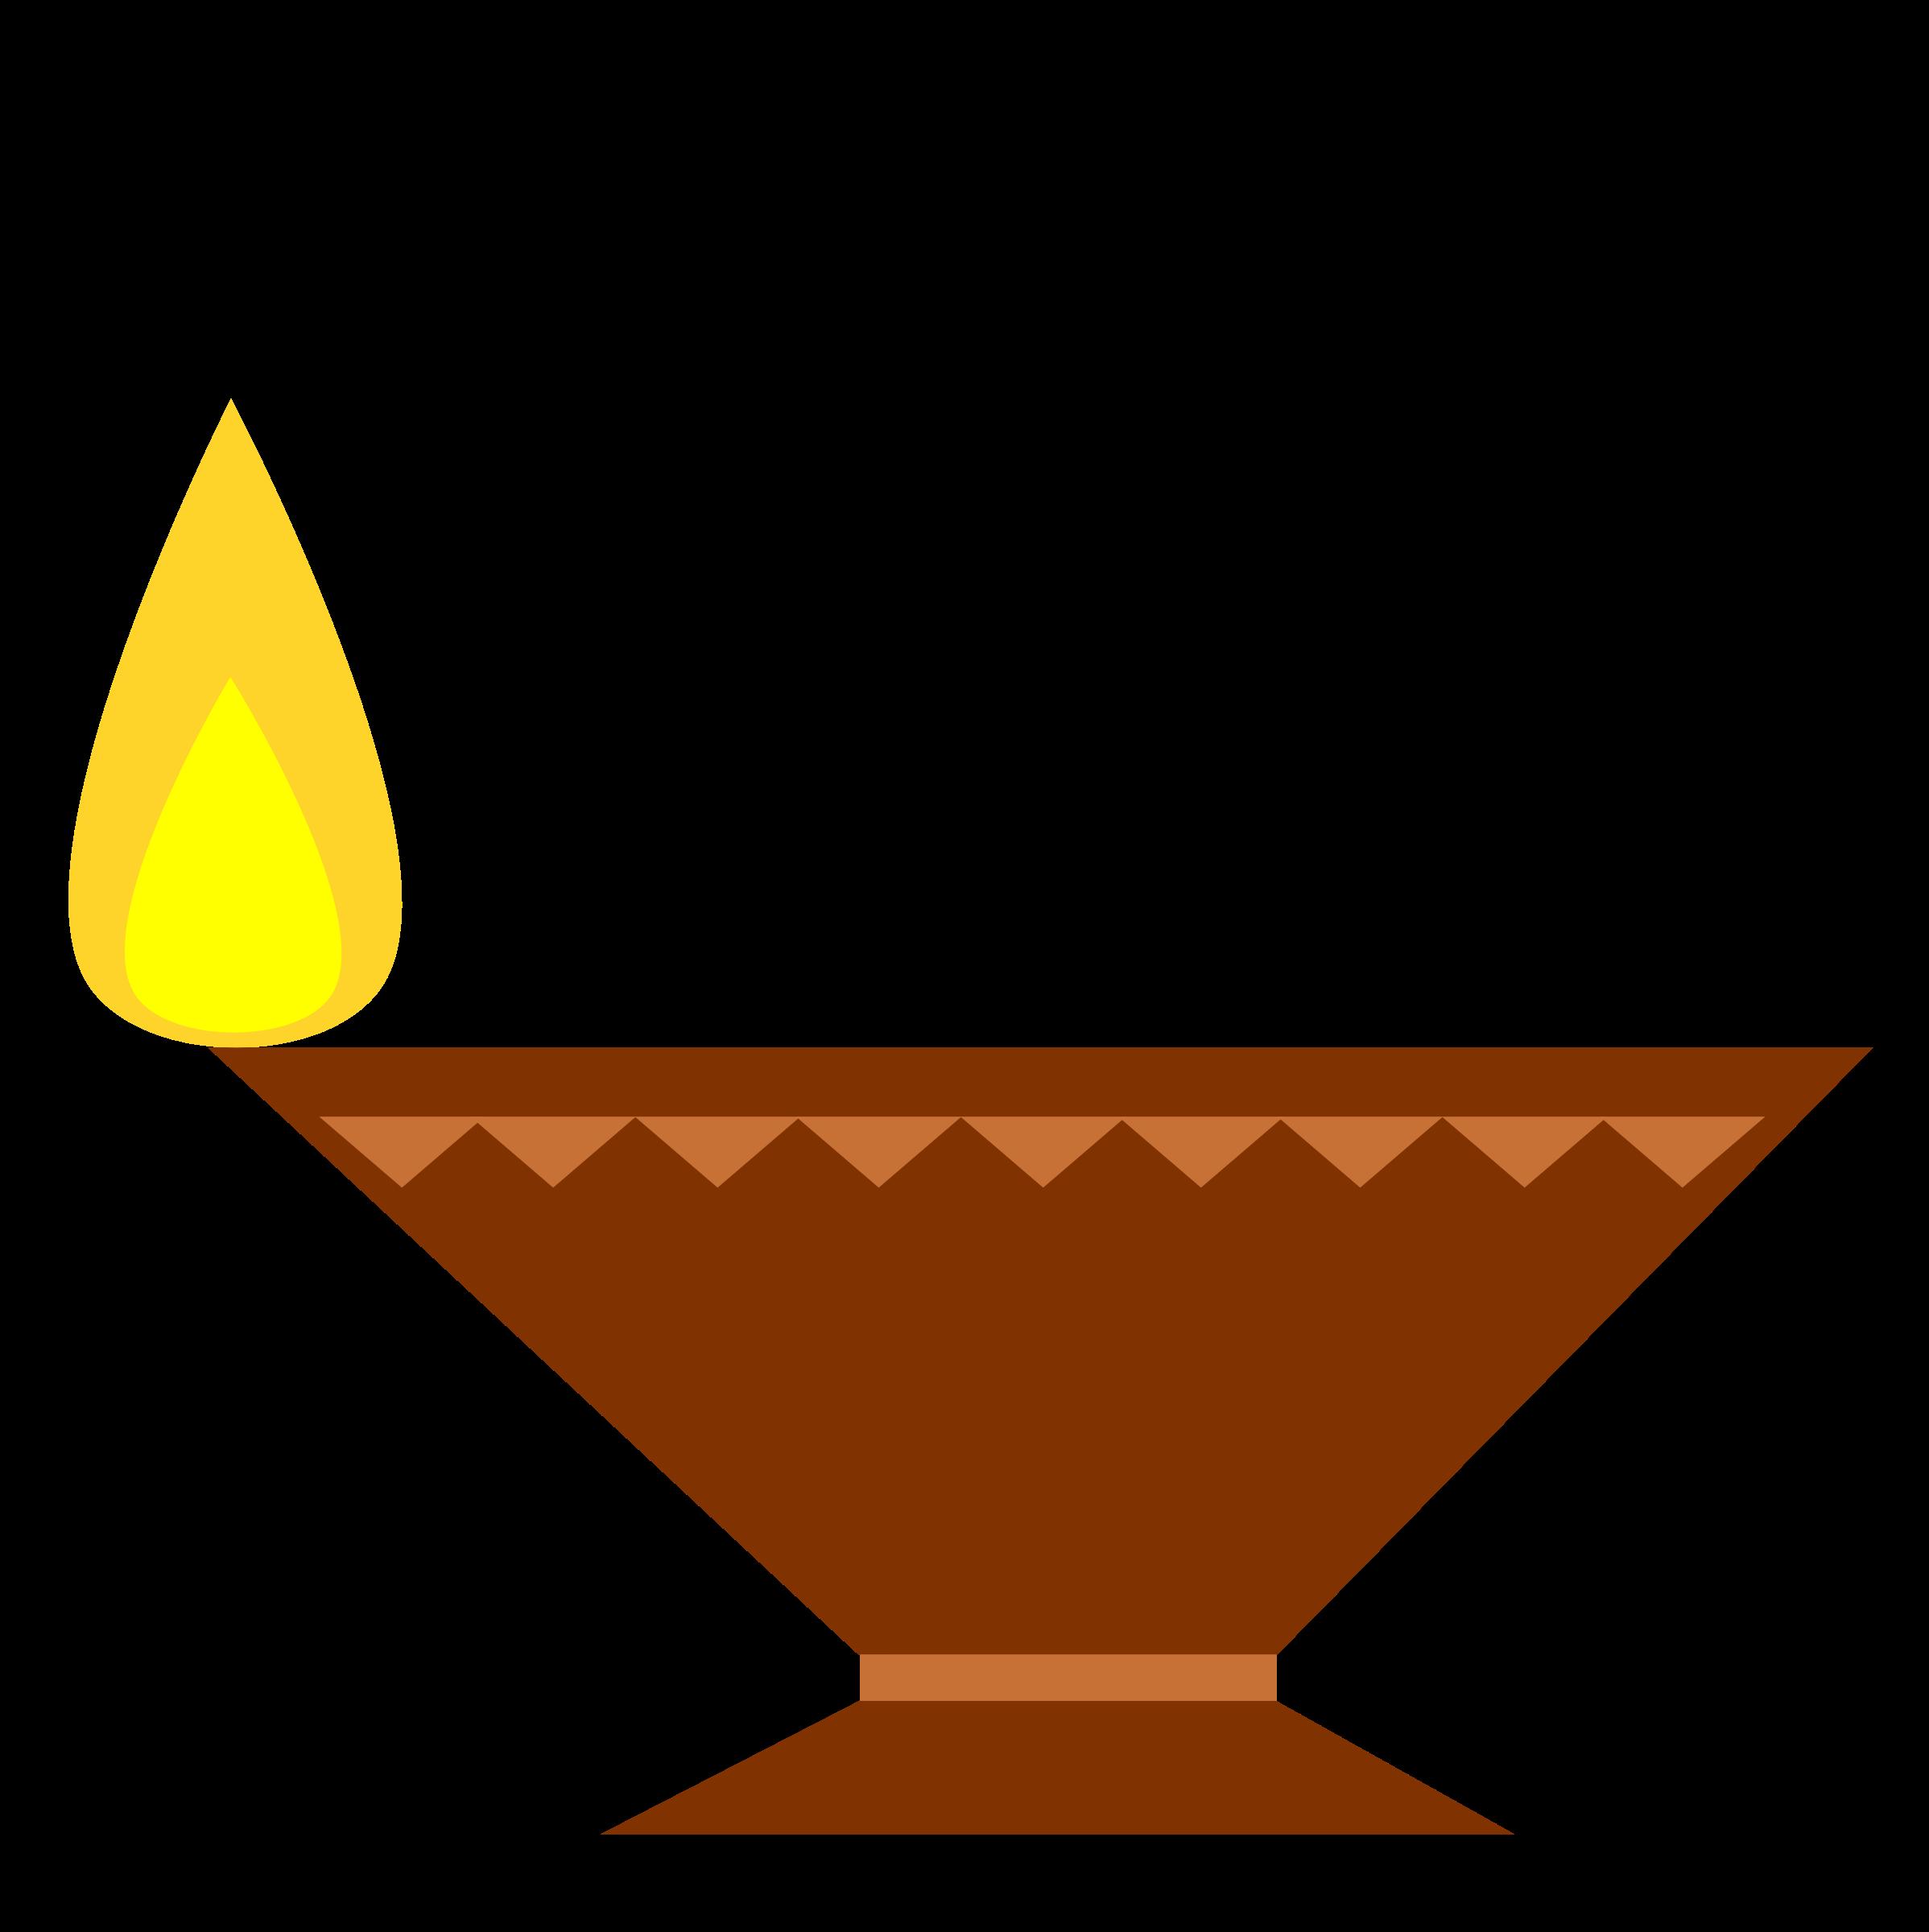 Clipart - Simple Diya PNG